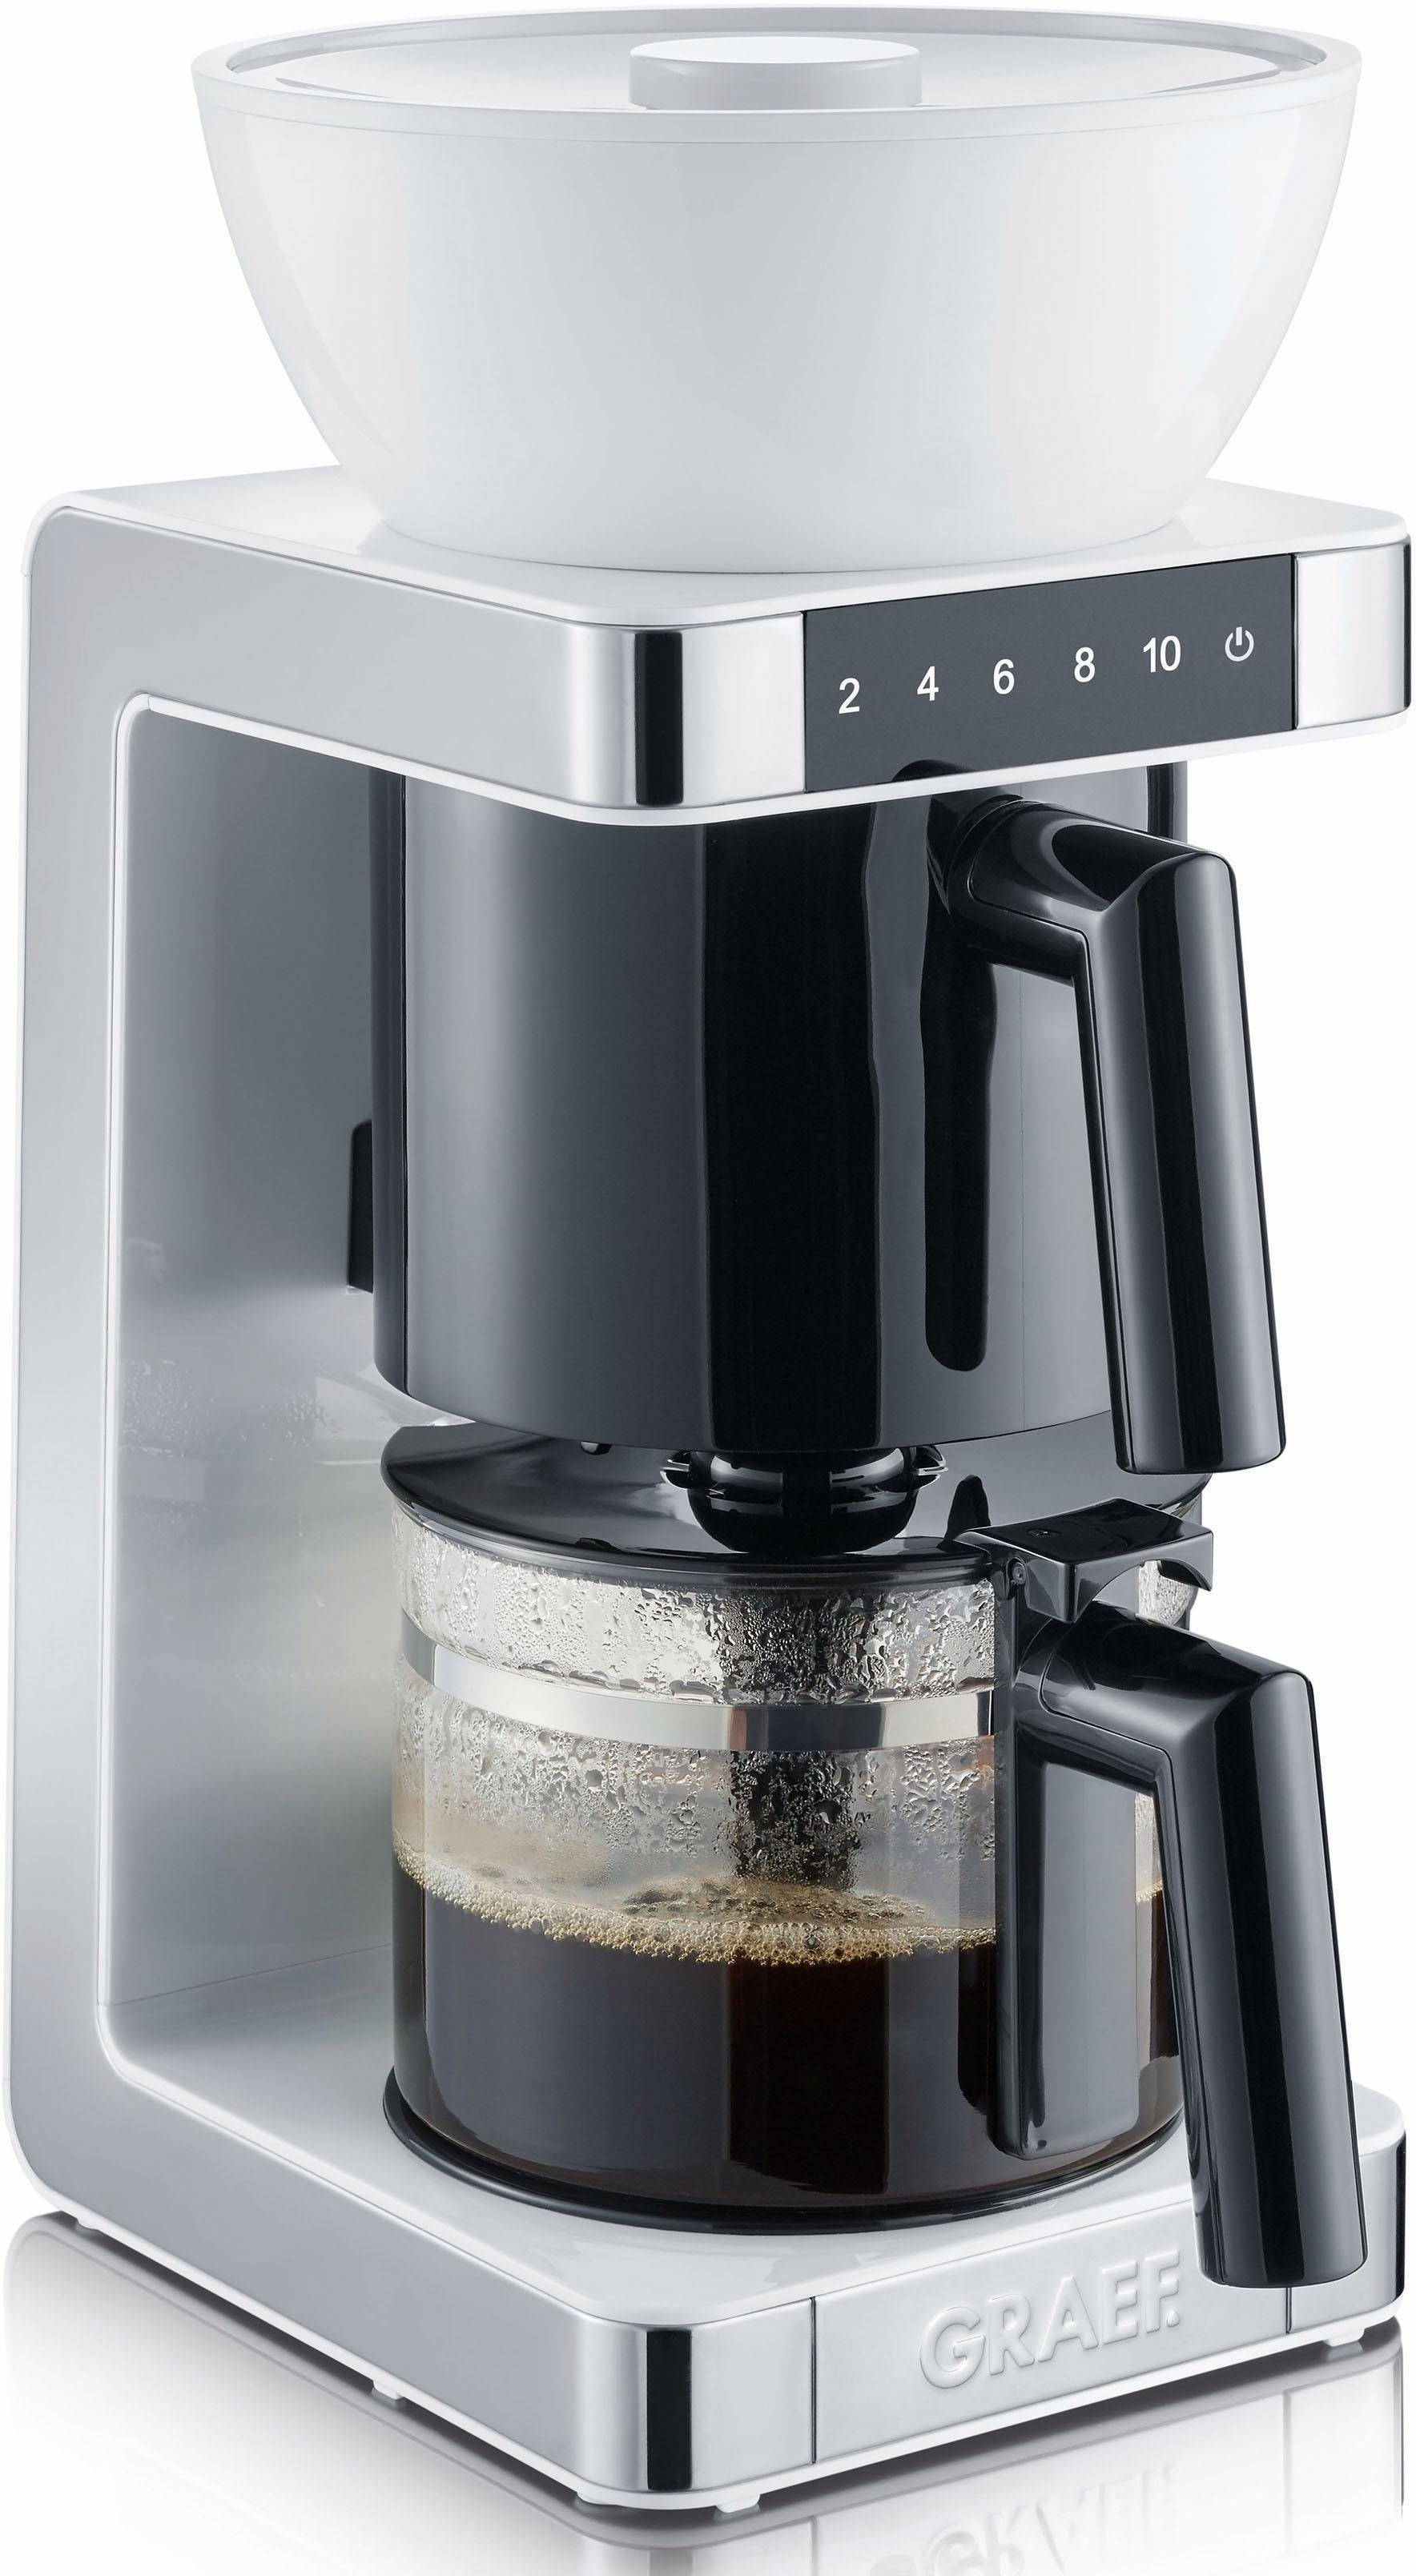 Graef Filterkaffeemaschine FK 701, 1,25l Kaffeekanne, Papierfilter 1x4